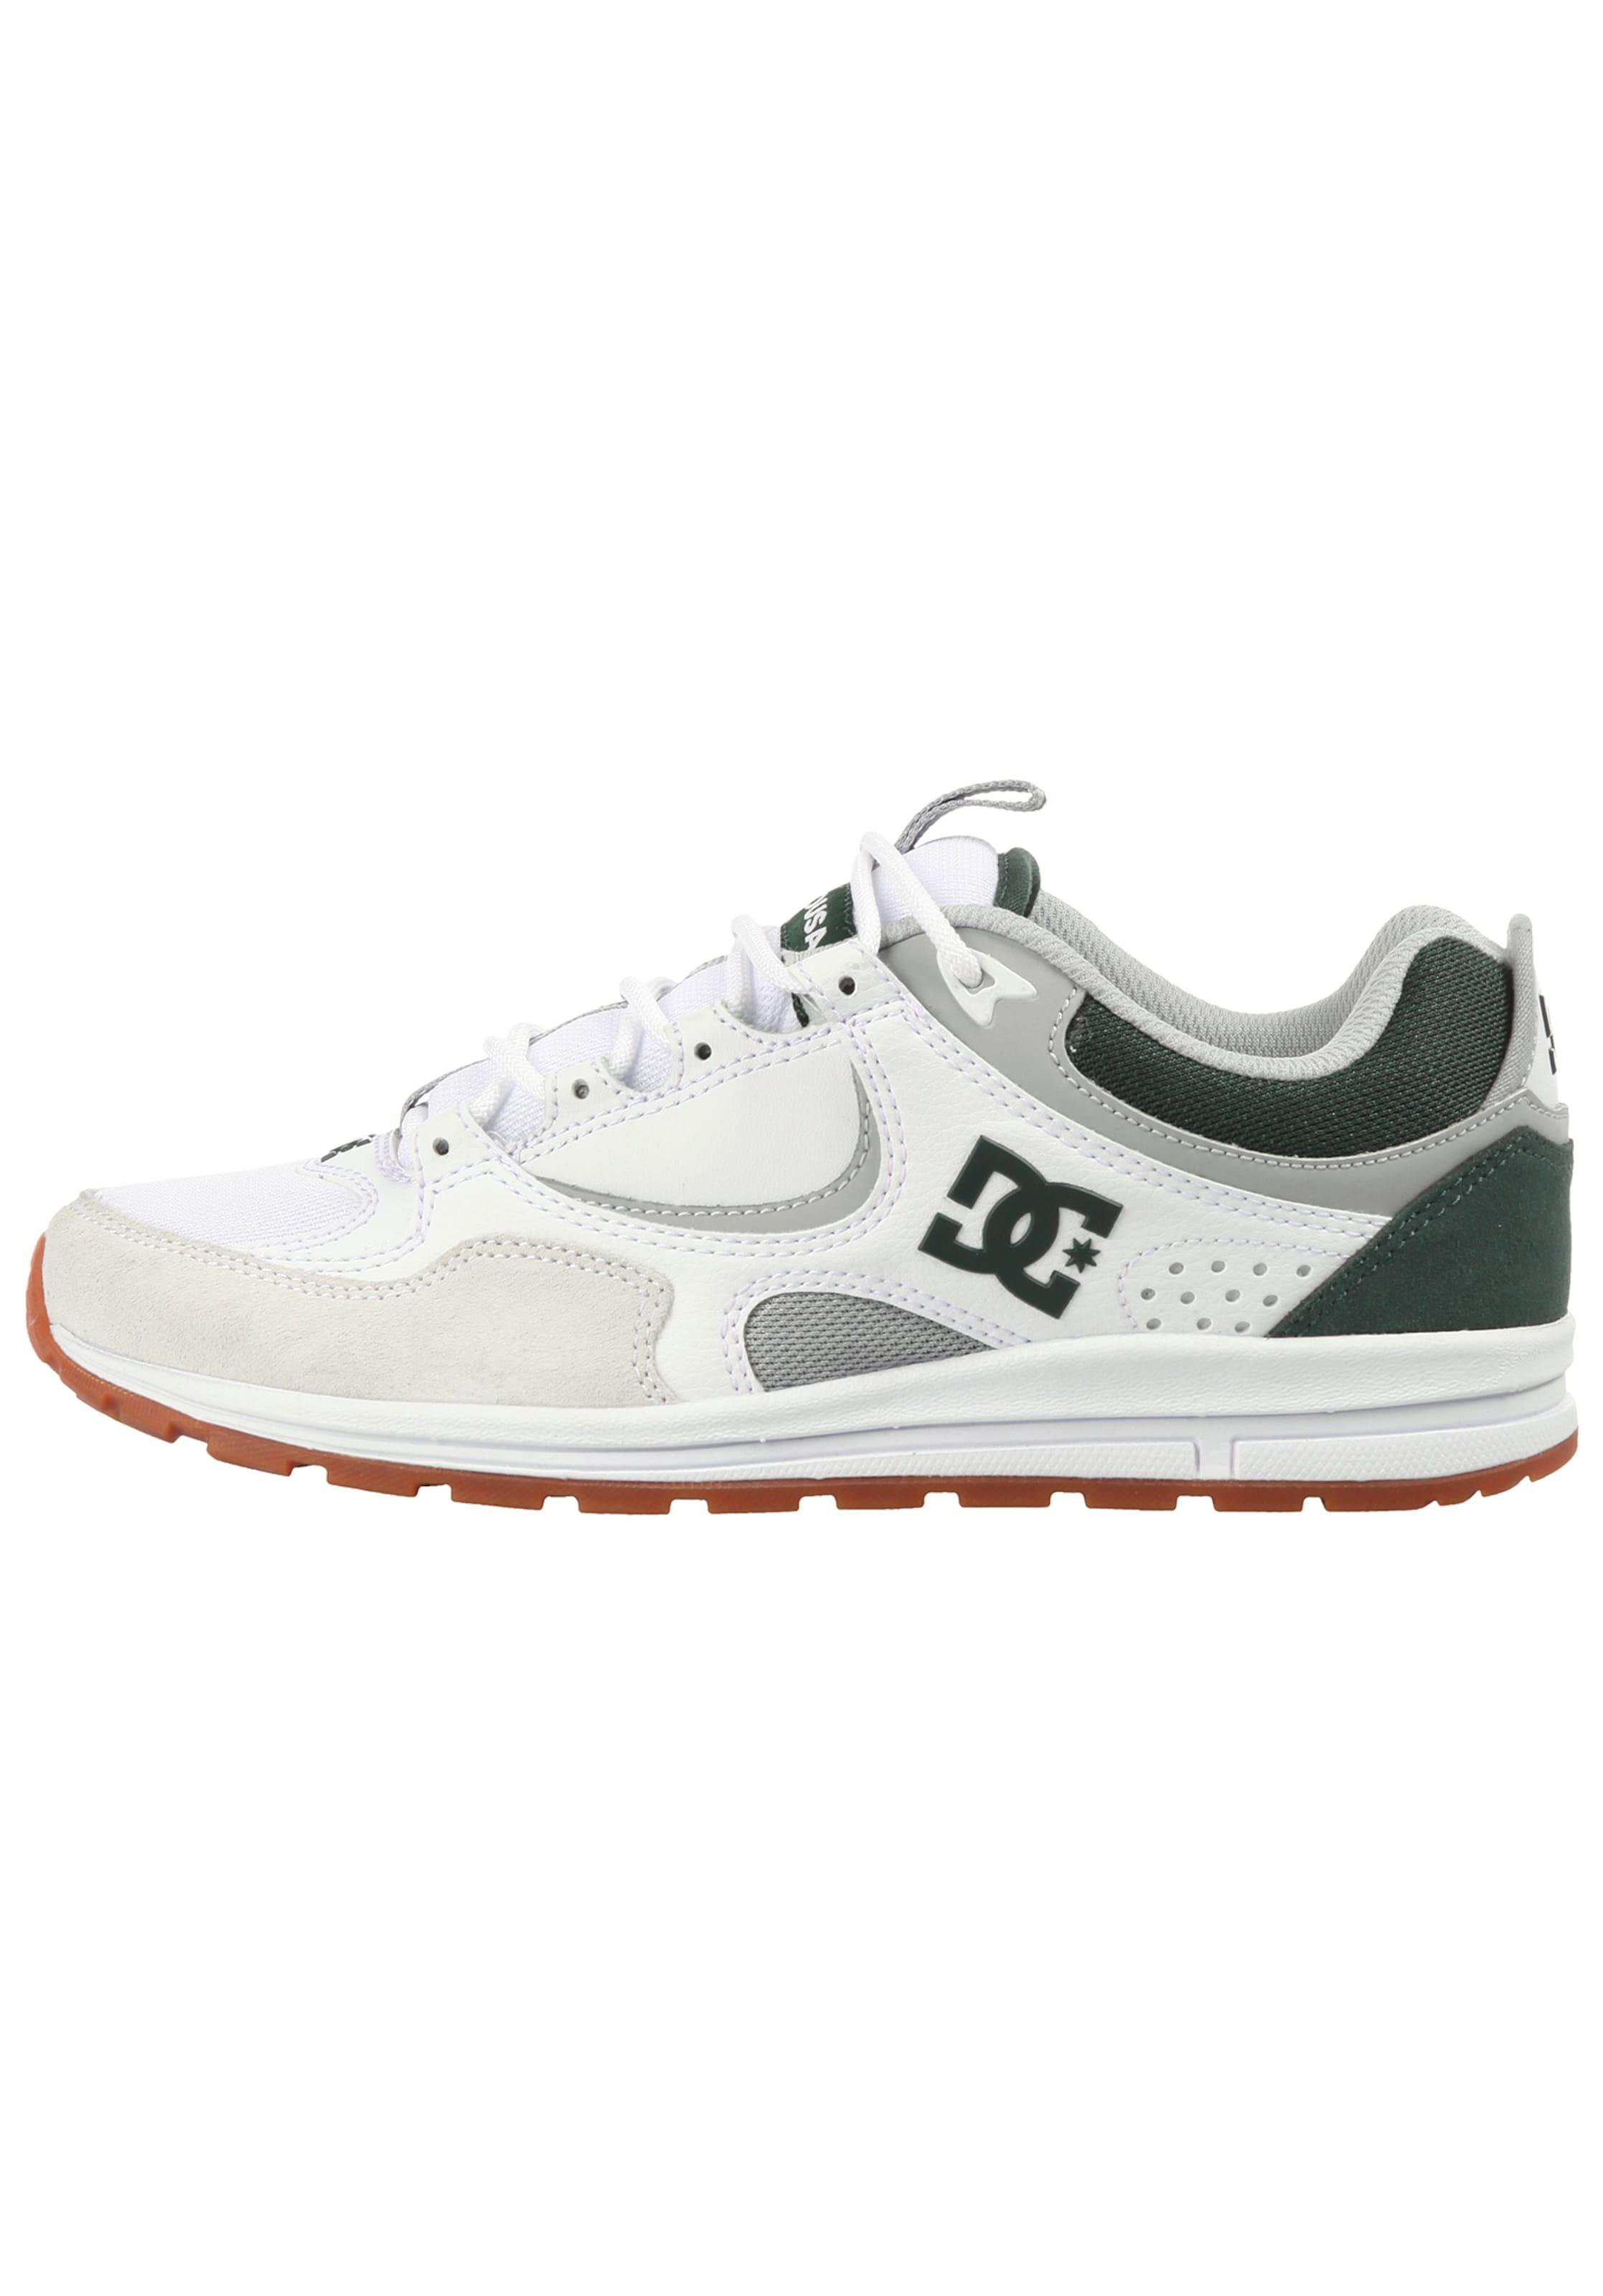 Lite' 'kalis Weiß In Shoes BeigeGrau Dc Sneaker Tanne SMVzUp